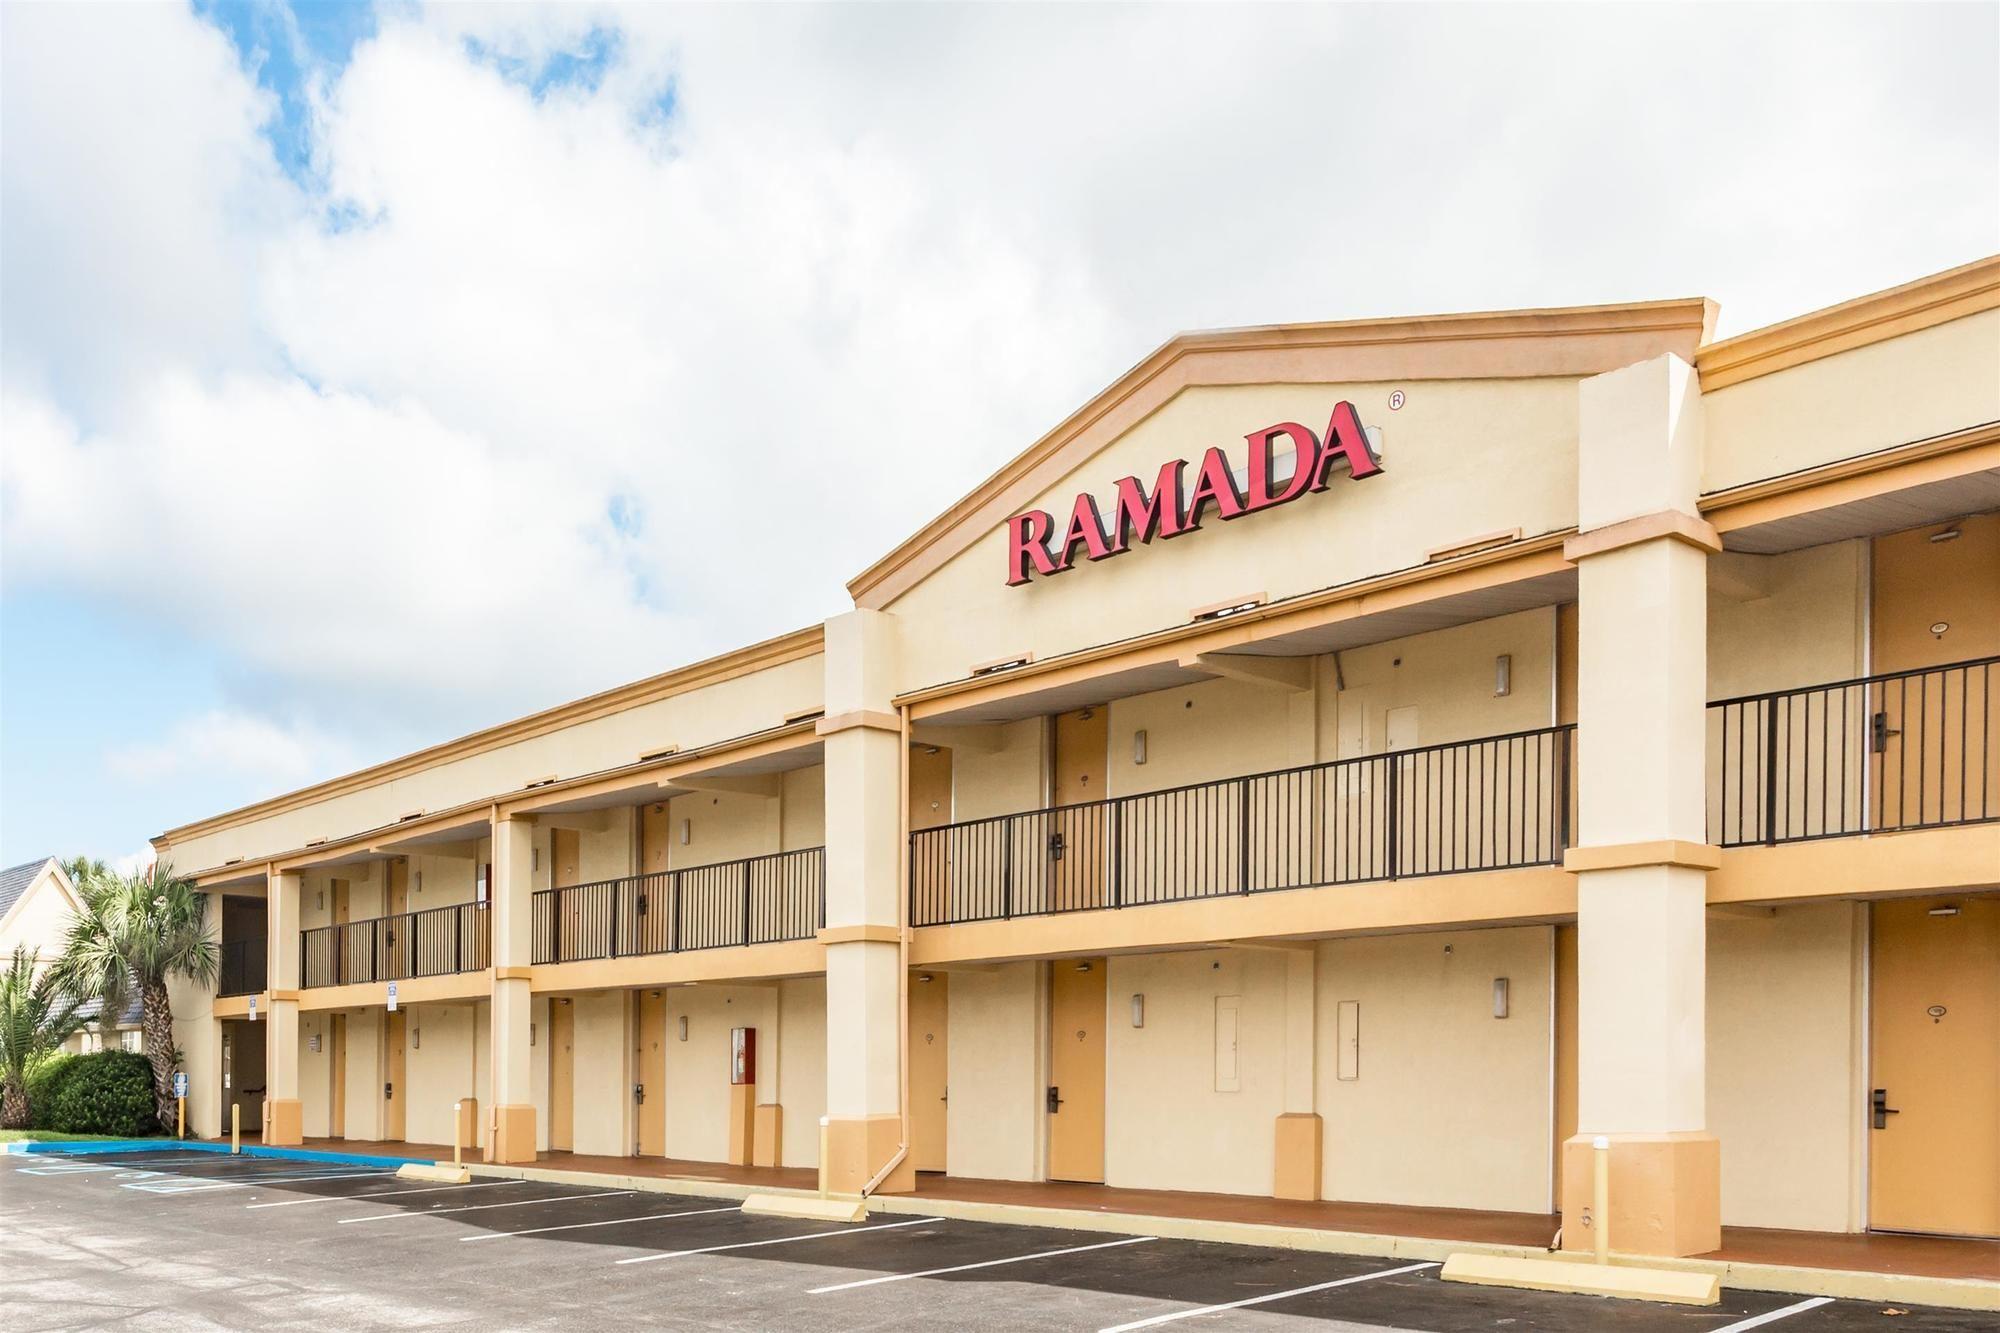 Ramada Limited in Lake City, FL